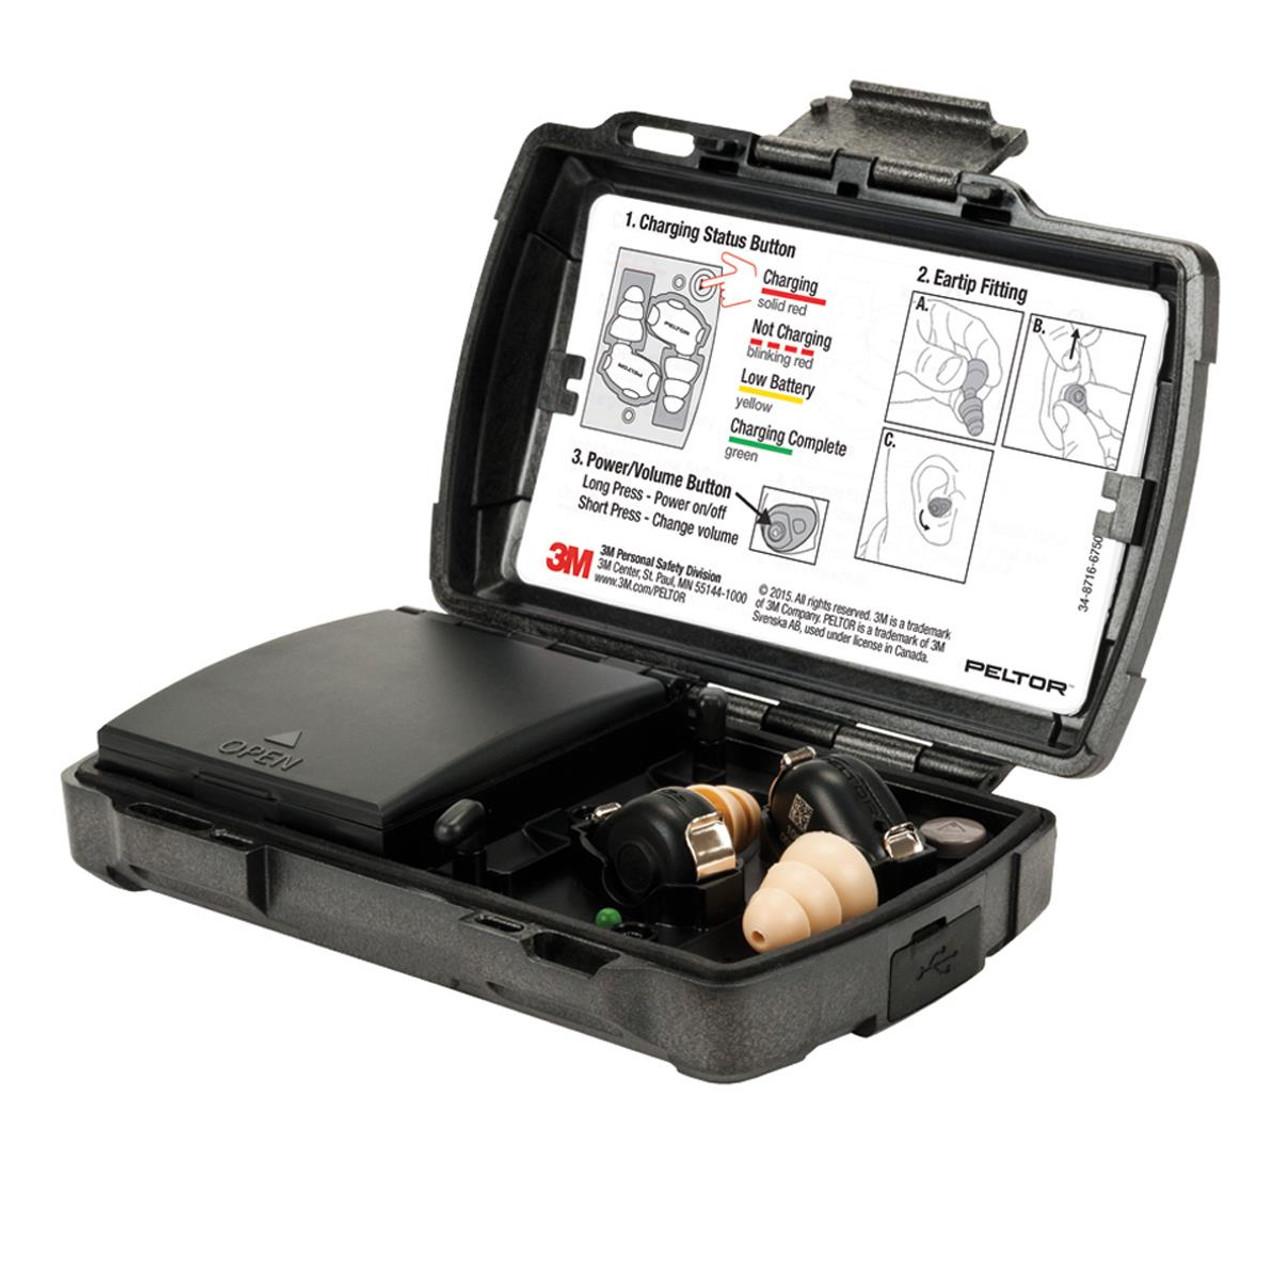 Black Peltor TEP-100 Tactical Electronic Ear Plug Kit